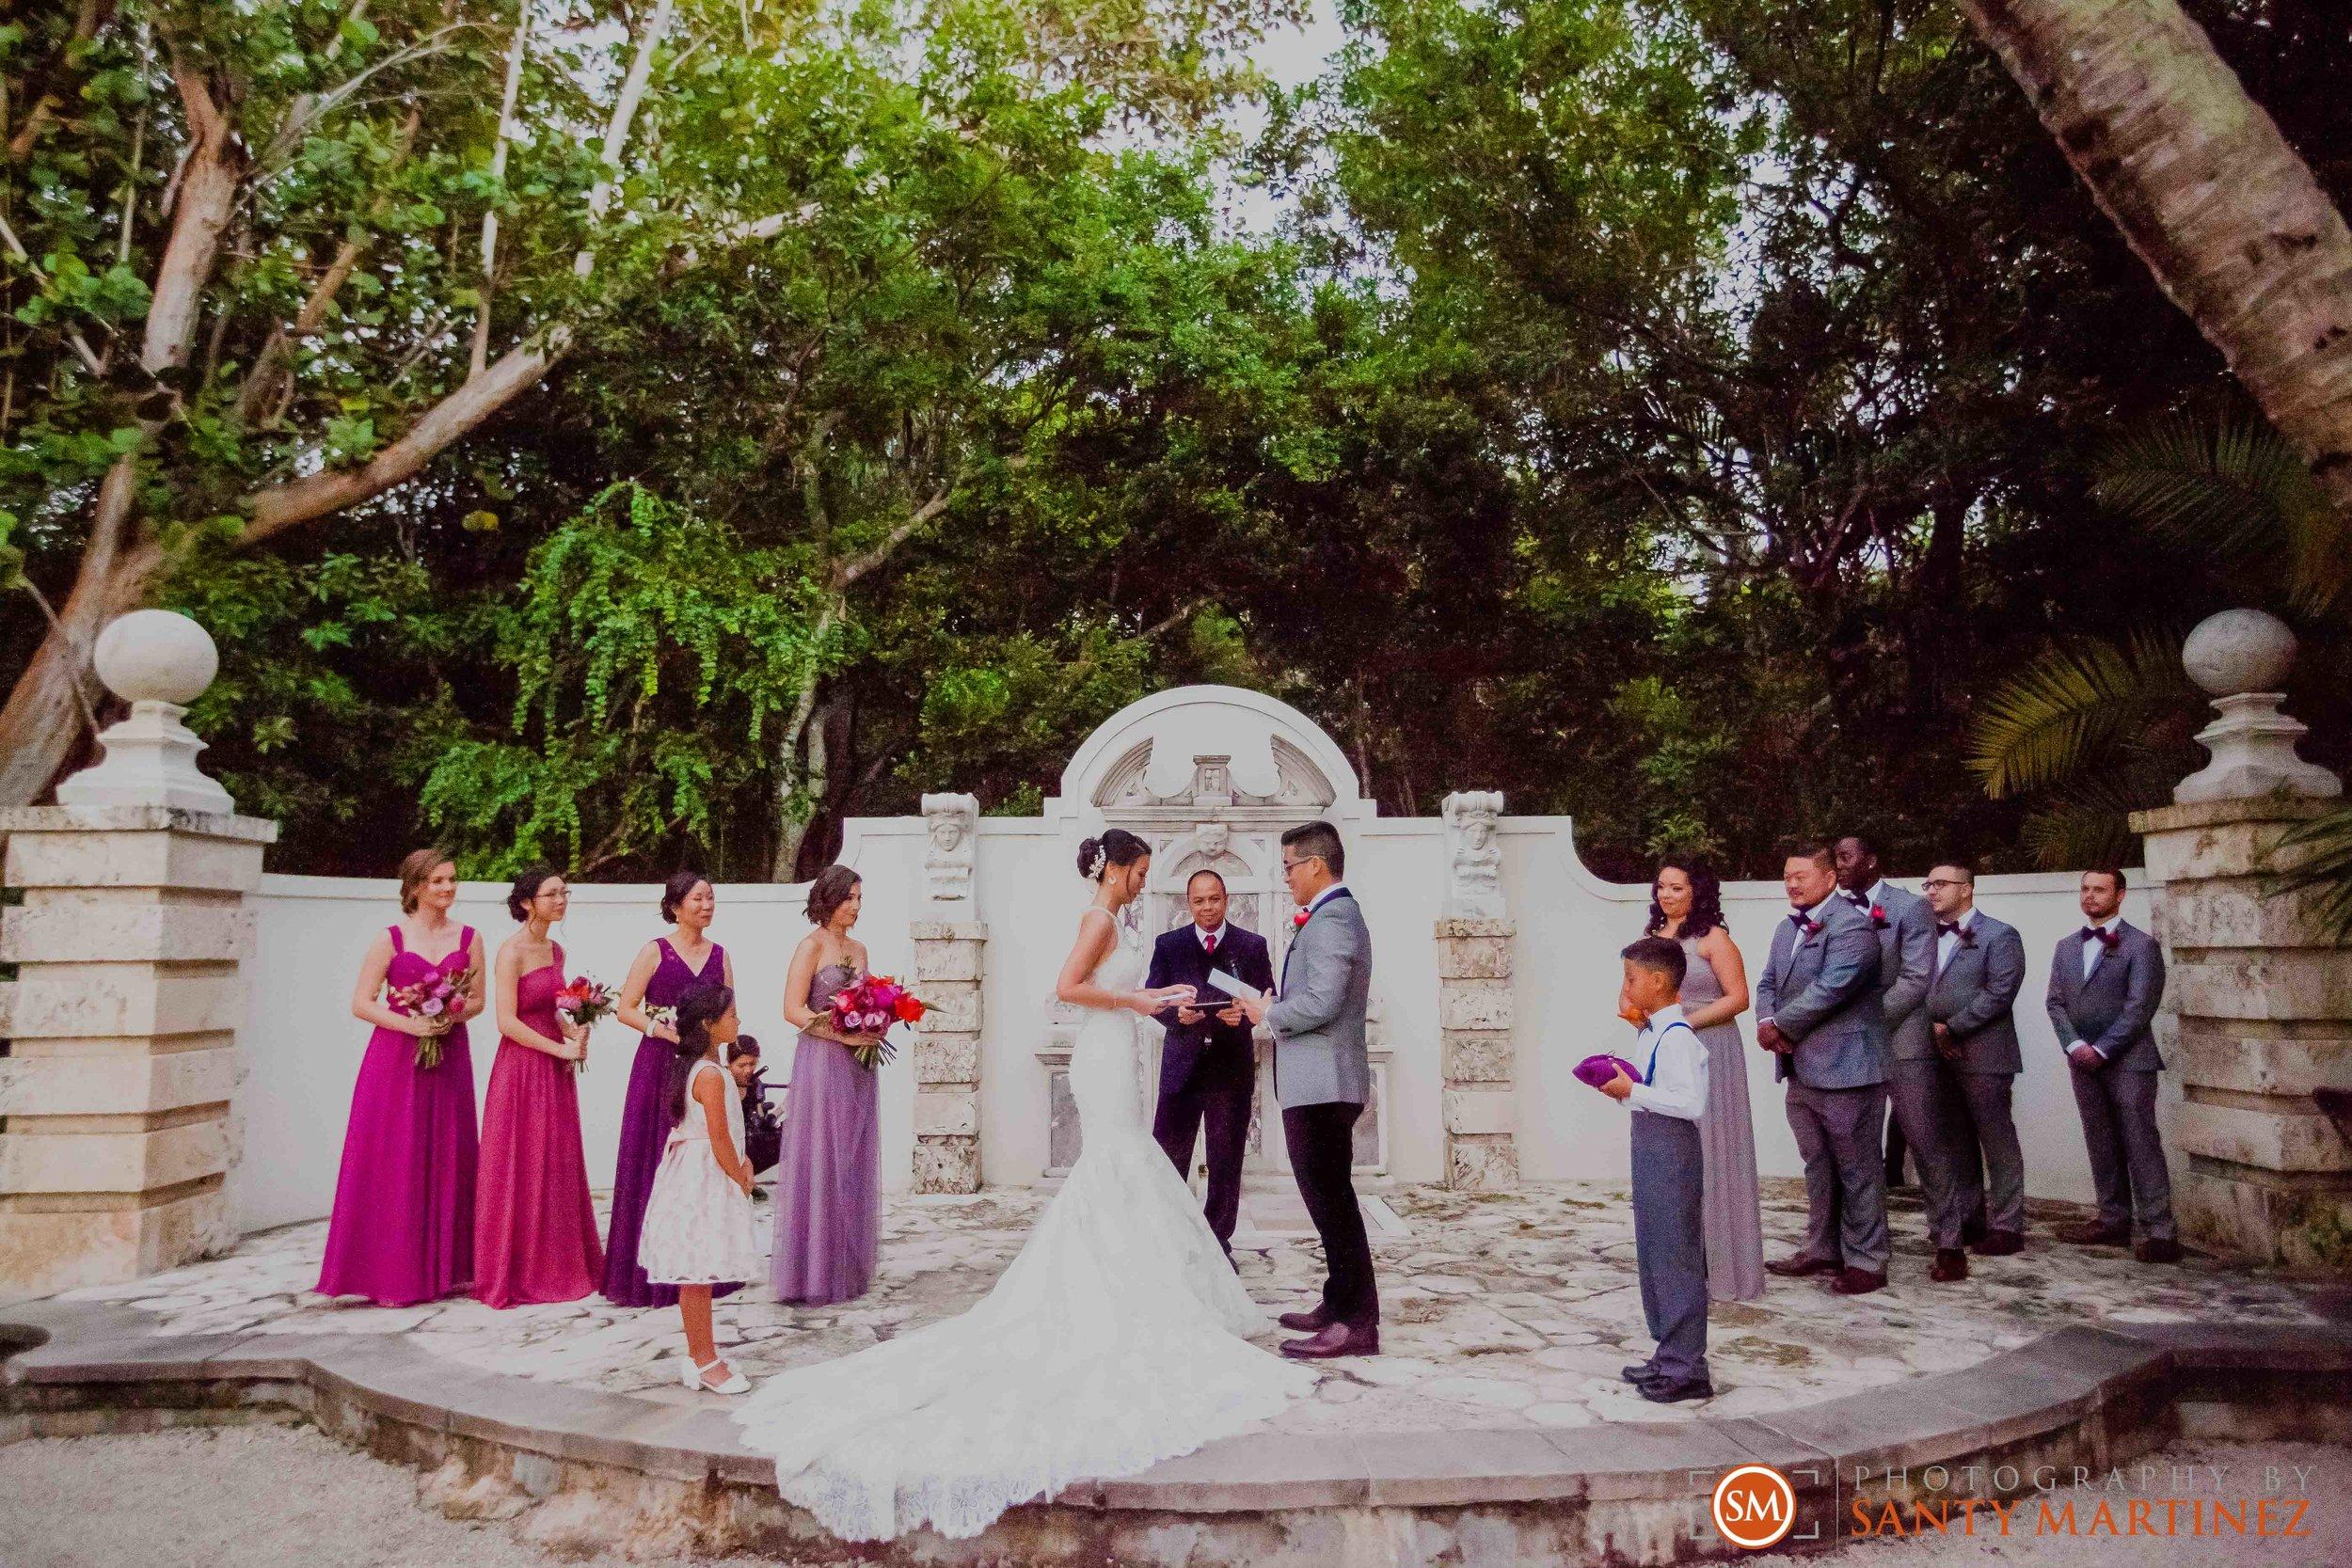 Wedding Bonnet House - Photography by Santy Martinez-28.jpg